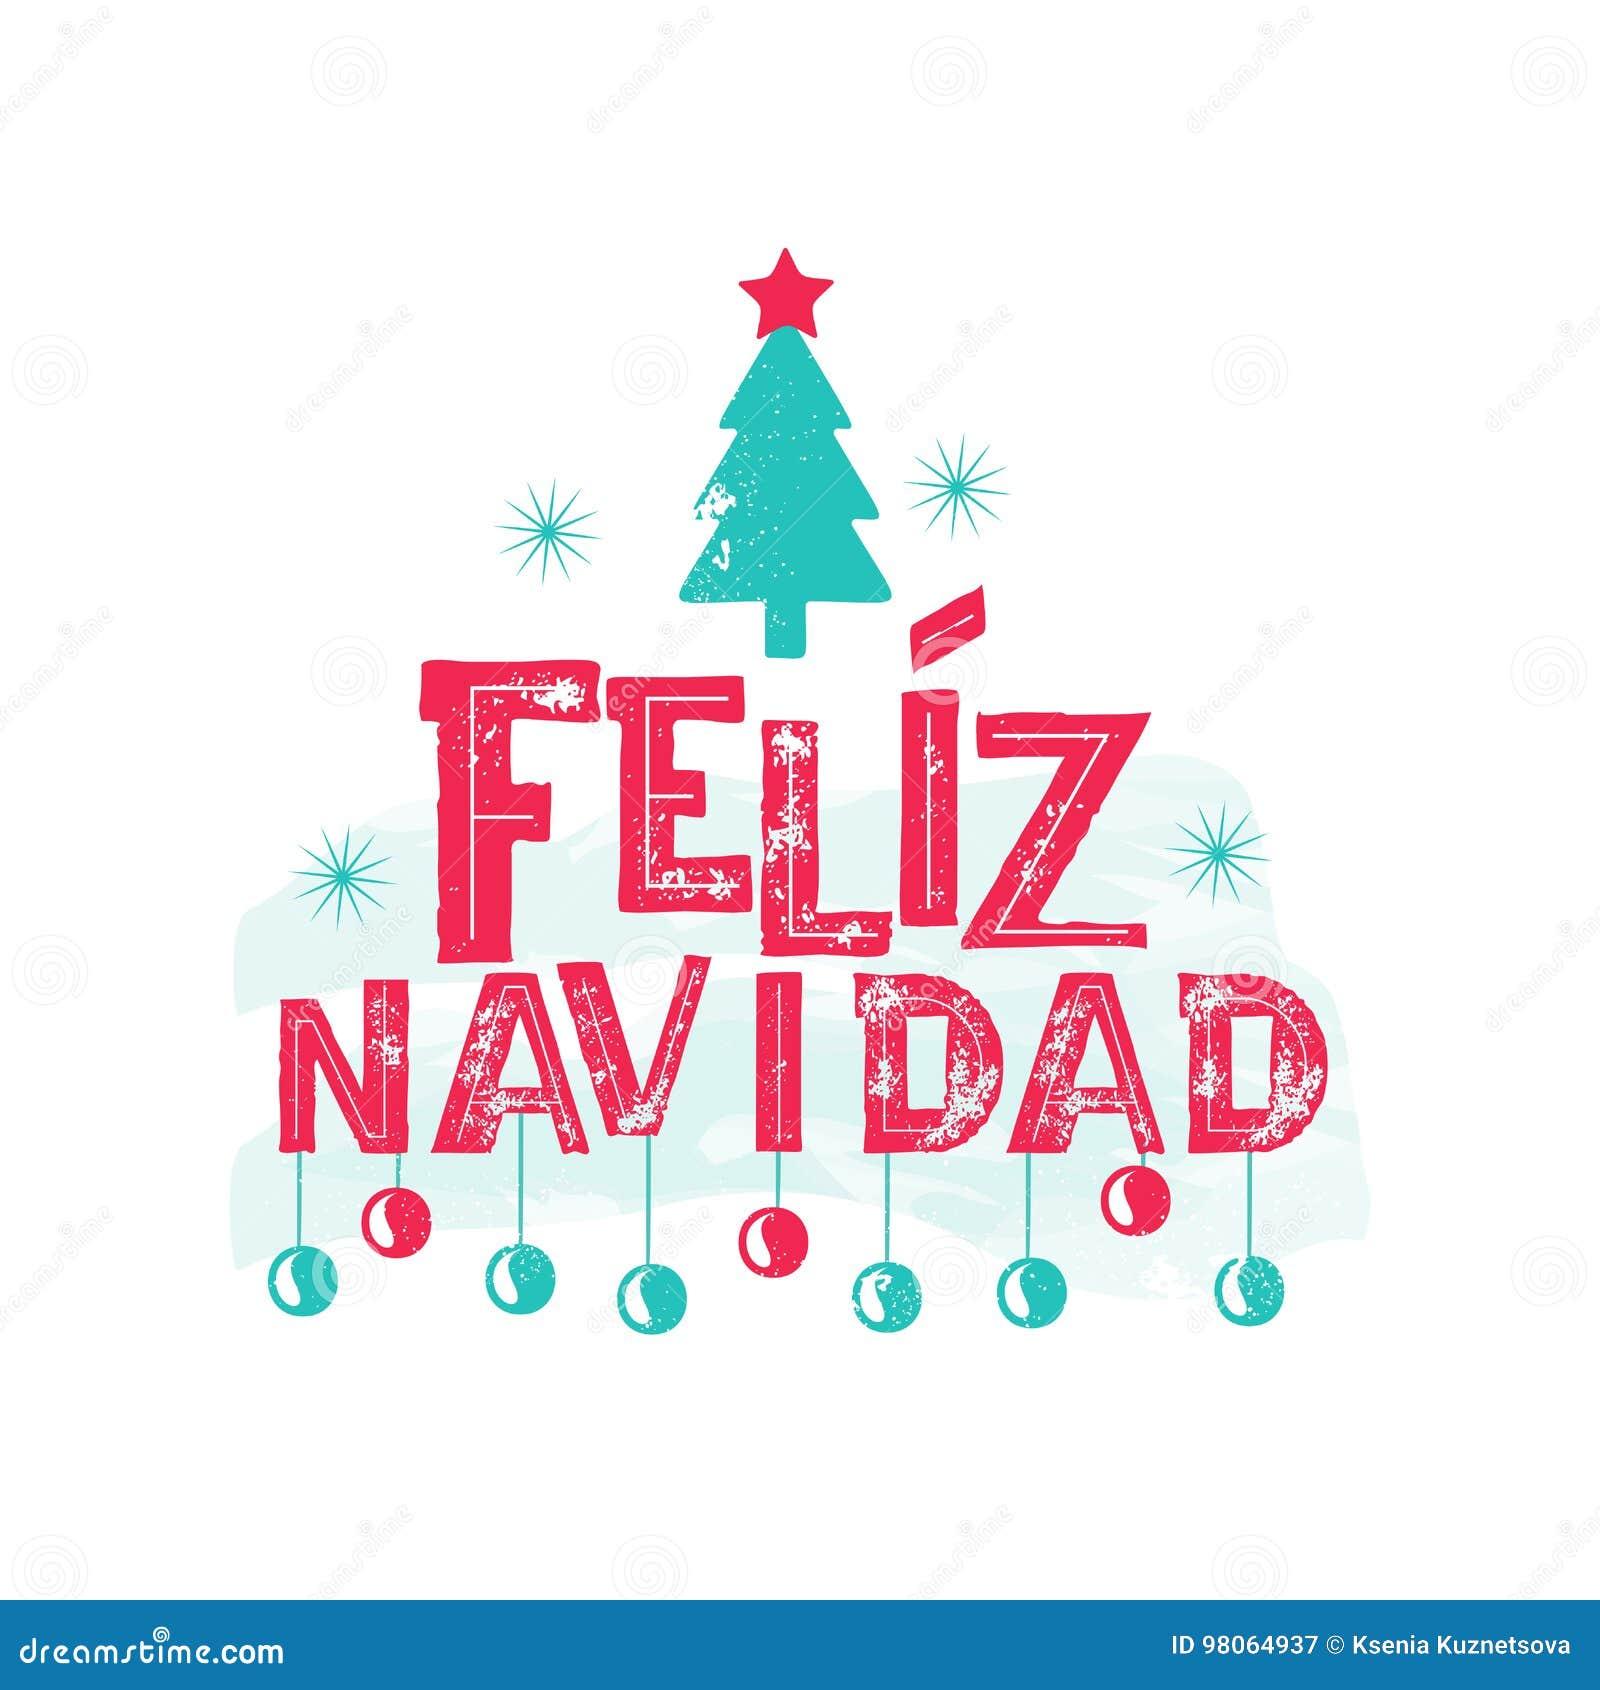 Feliz Navidad Joyeux Noel 2019.Feliz Navidad Langue Espagnole De Joyeux Noel Illustration